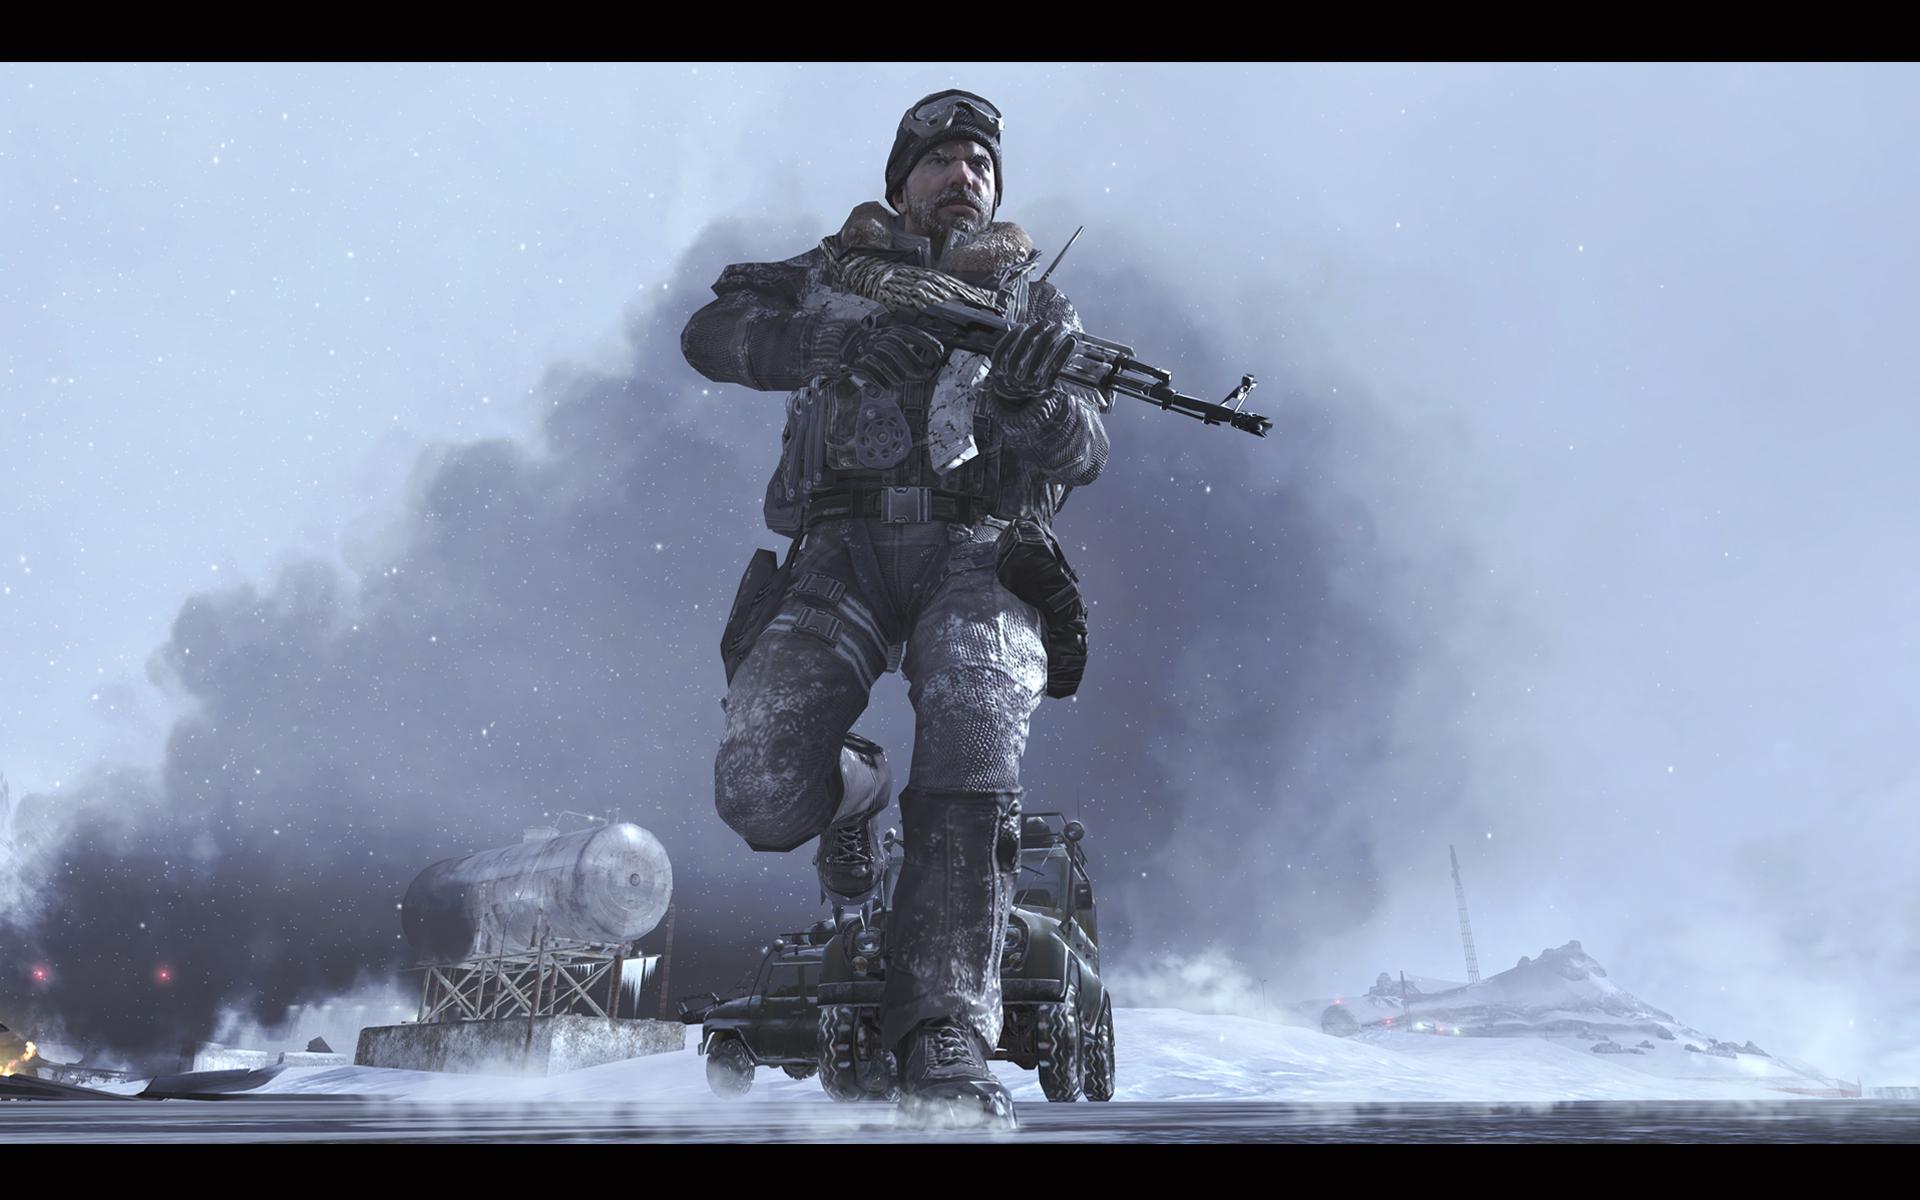 Call of duty modern warfare 2 wallpaper - Call of duty warfare wallpaper ...